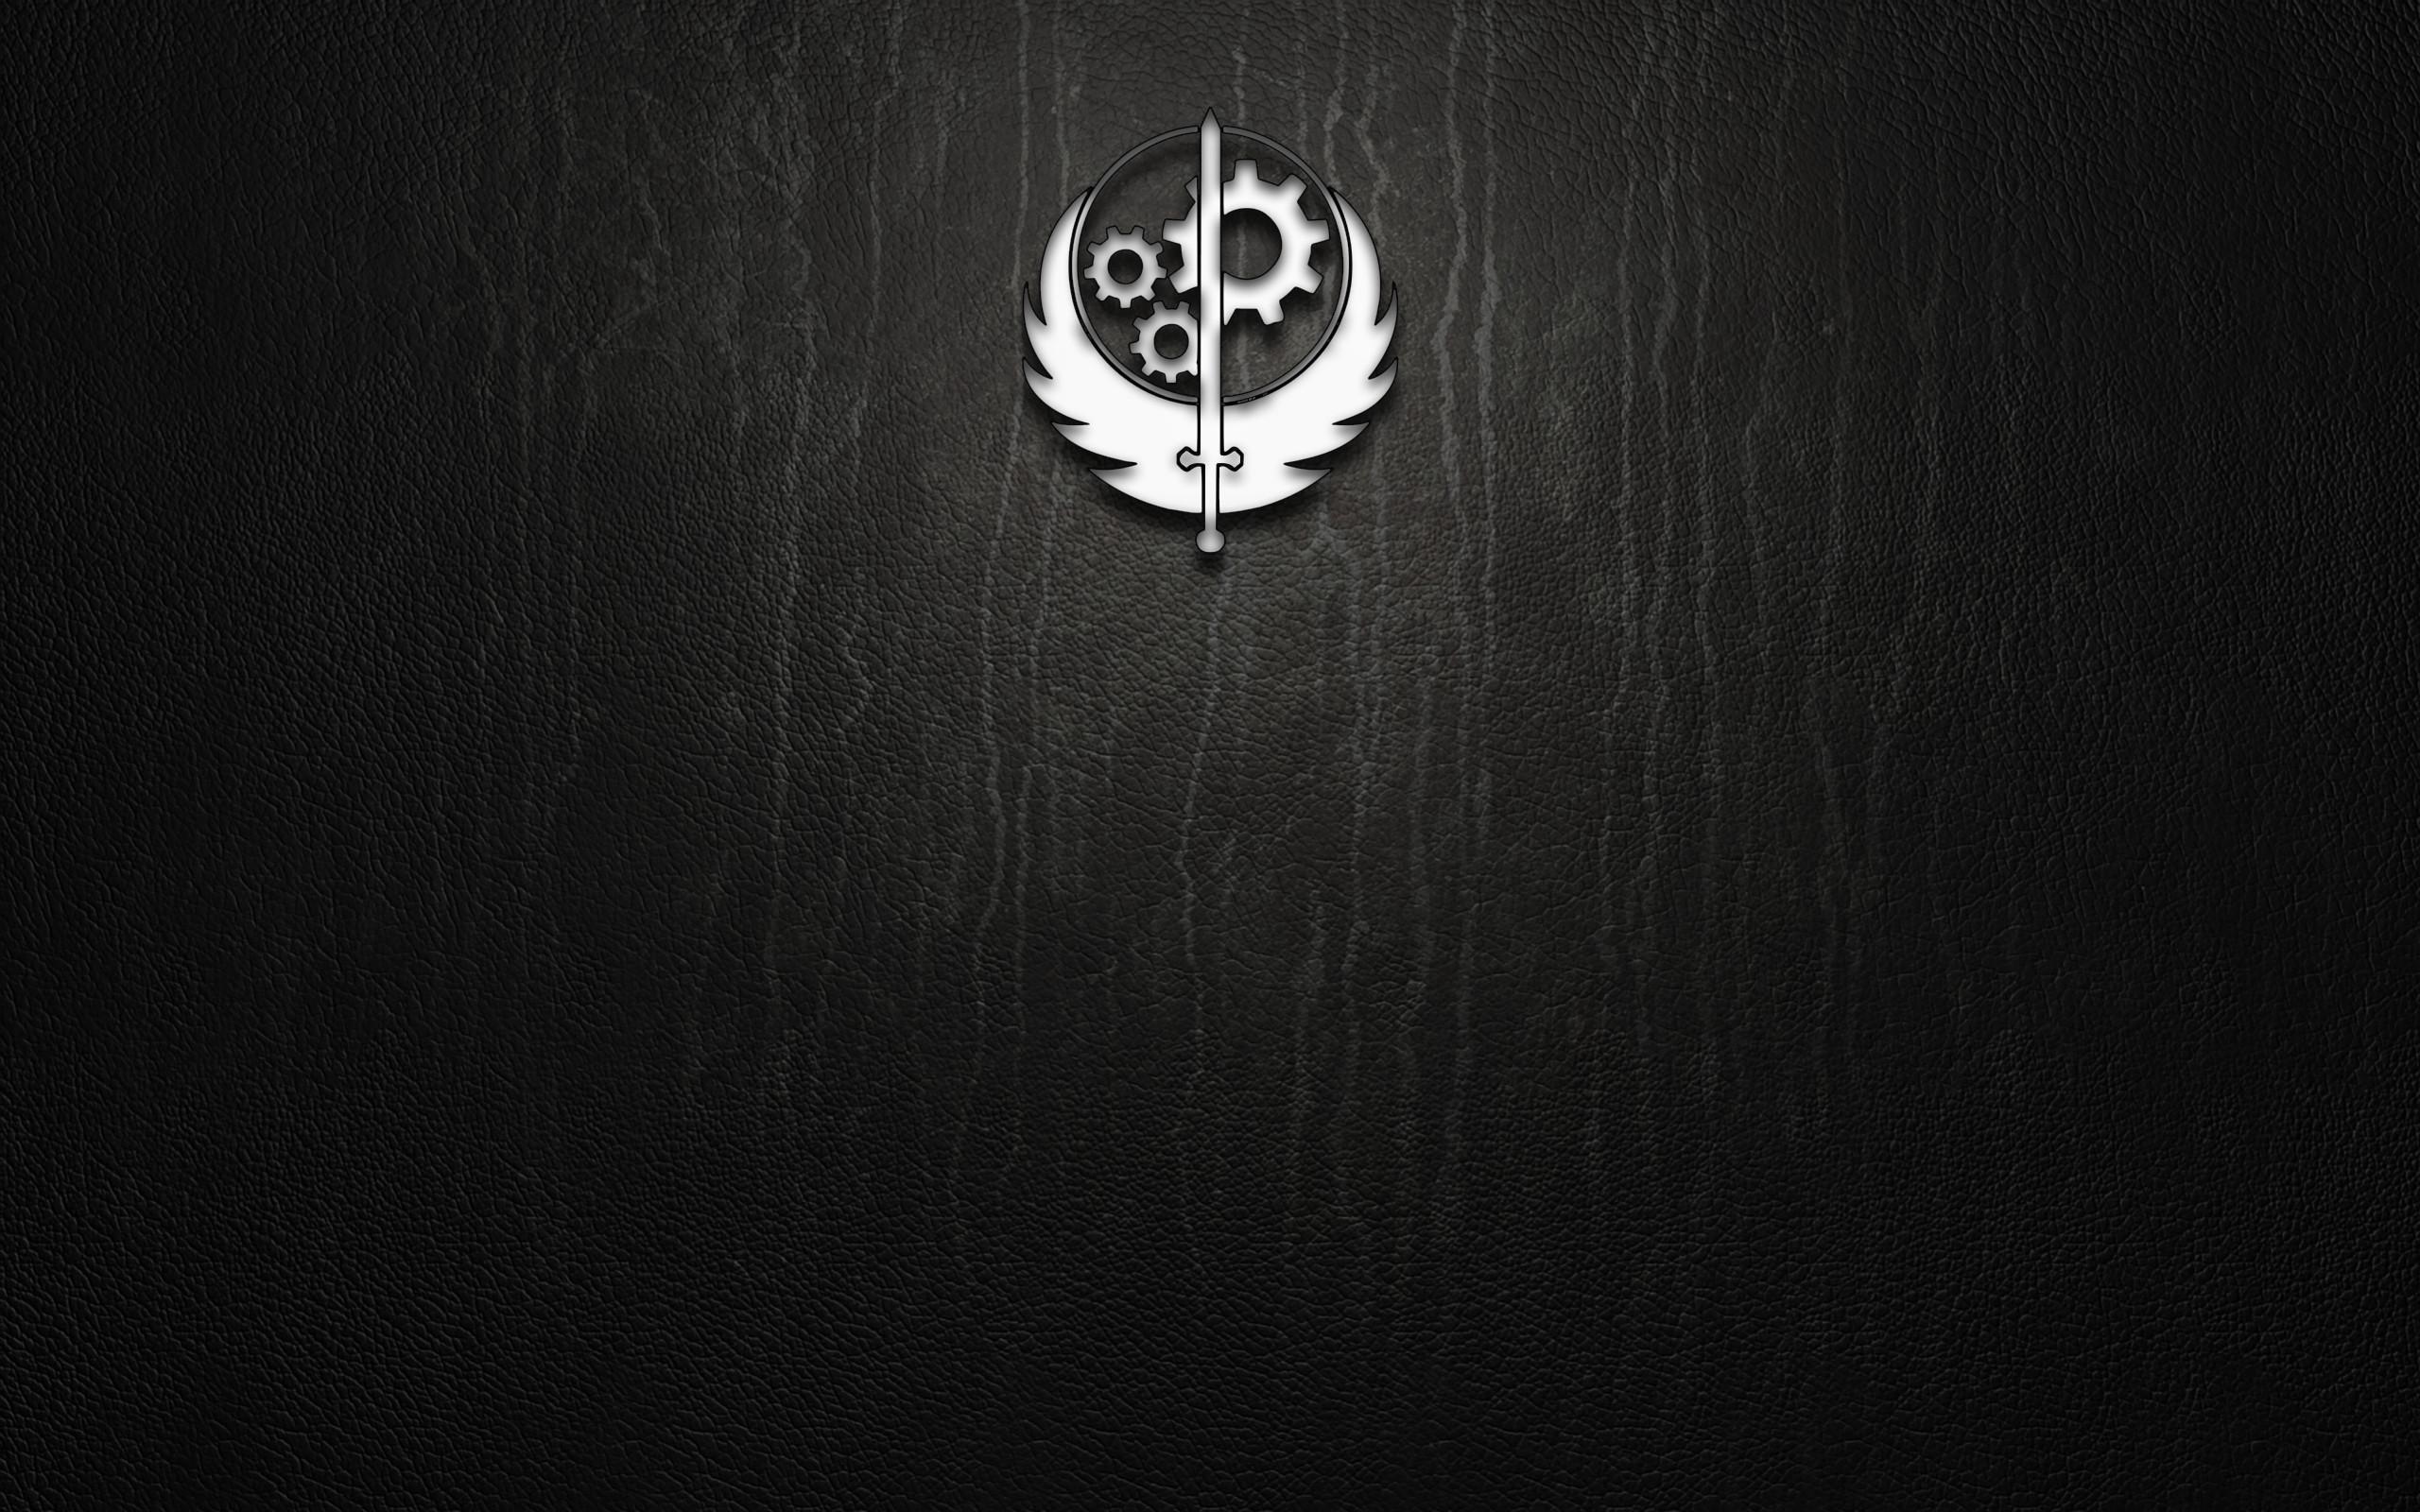 Brotherhood Of Steel Hd Wallpaper 61 Images